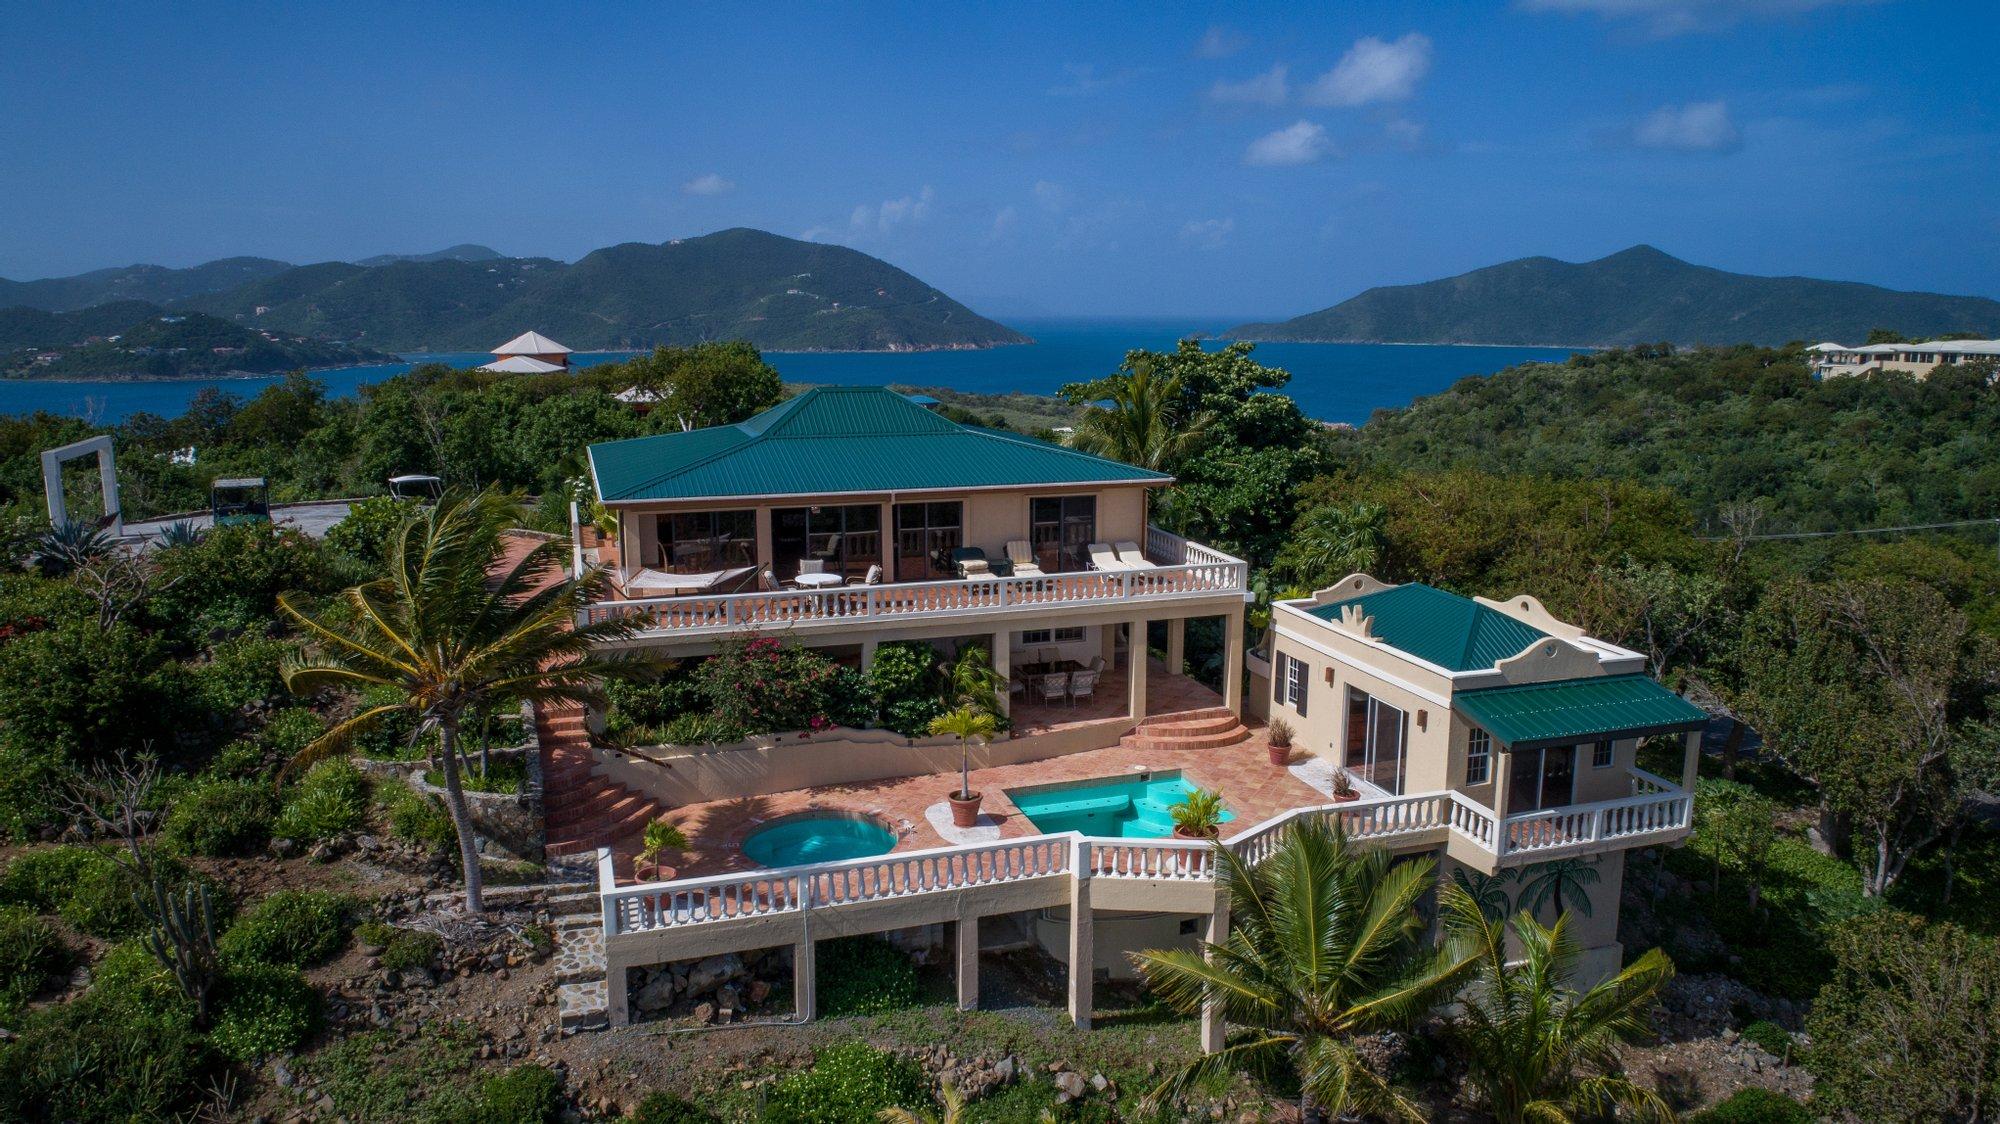 House in Blyden Yard, Tortola, British Virgin Islands 1